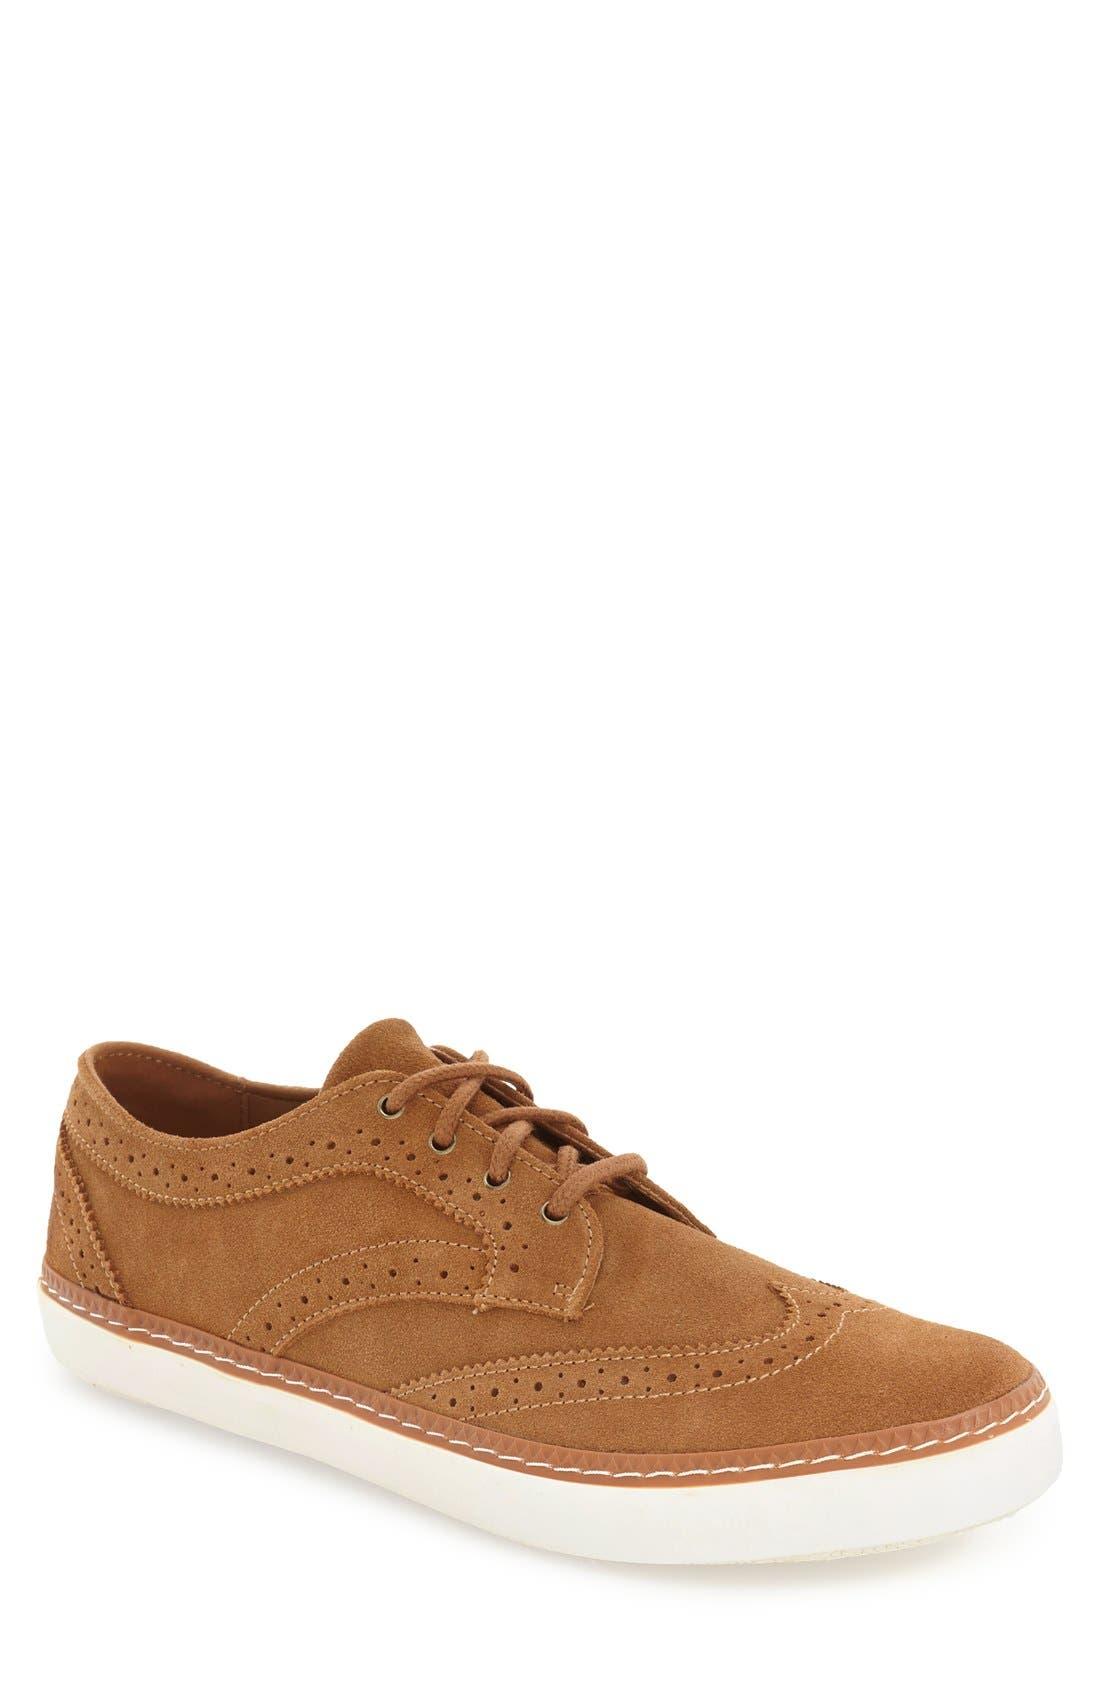 J SHOES 'Novello' Wingtip Sneaker